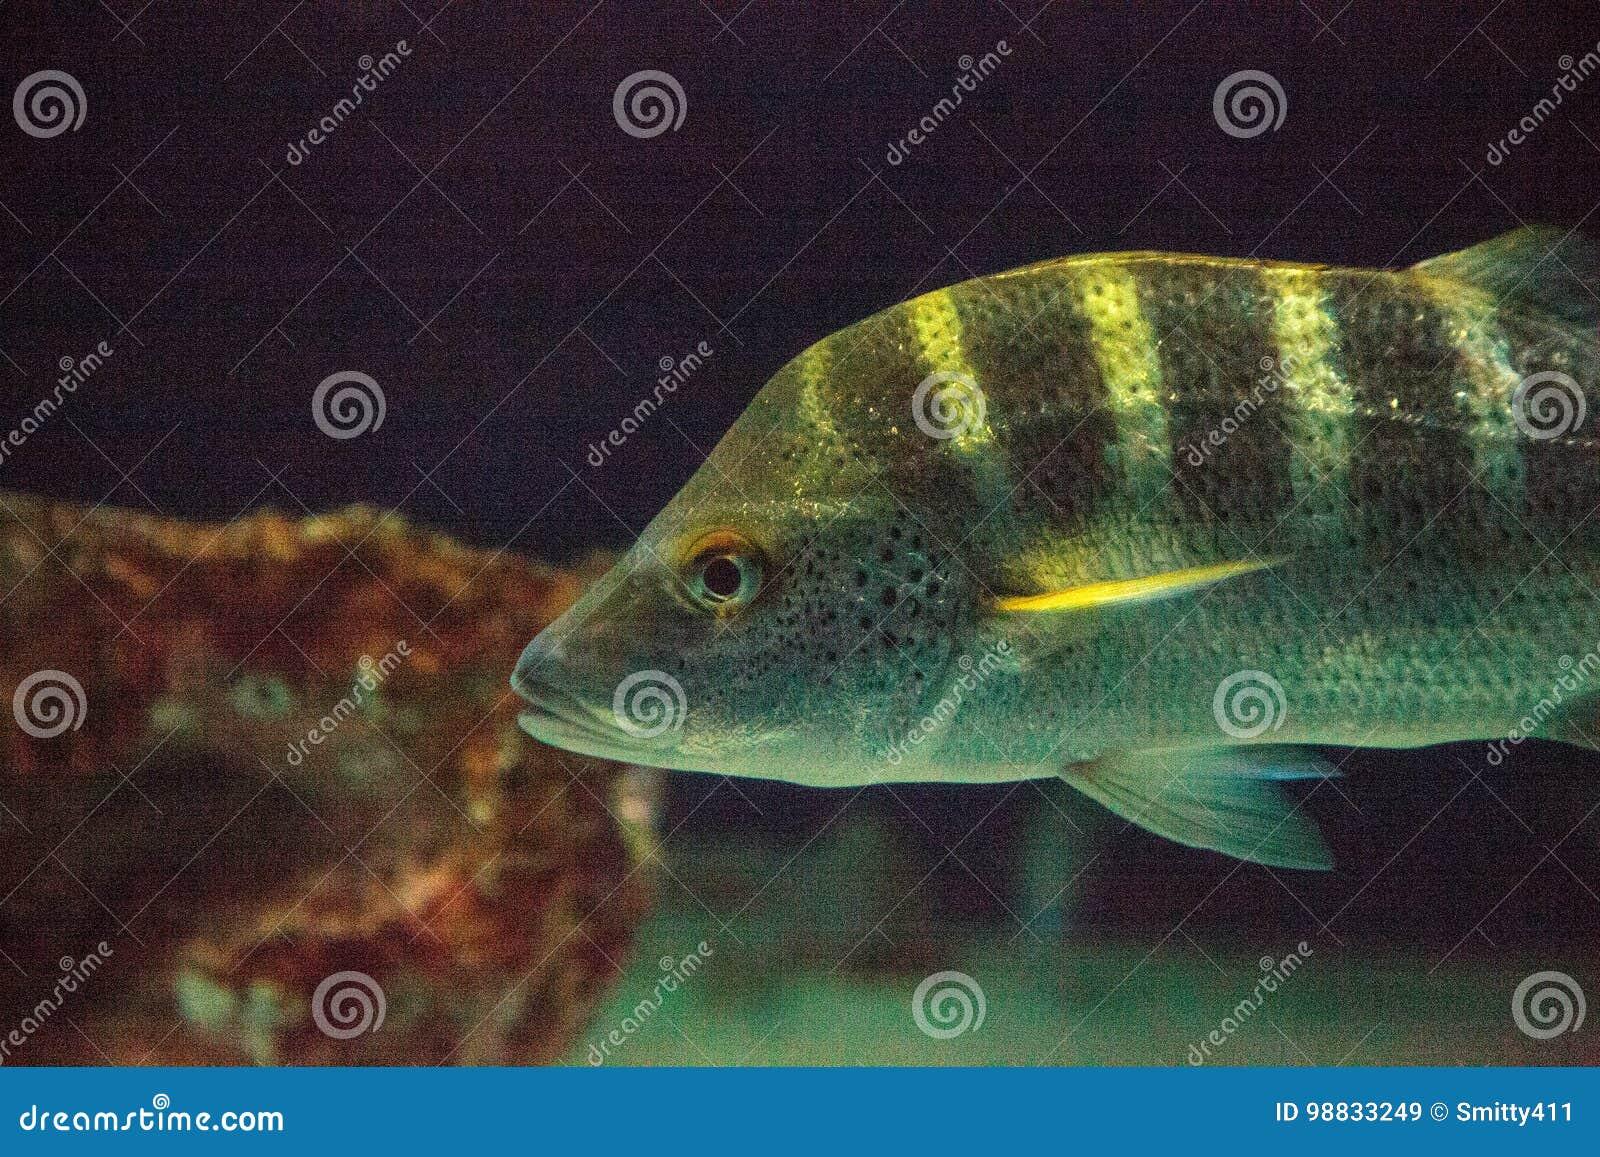 graybar grunt fish haemulon sexfasciatum stock image image of